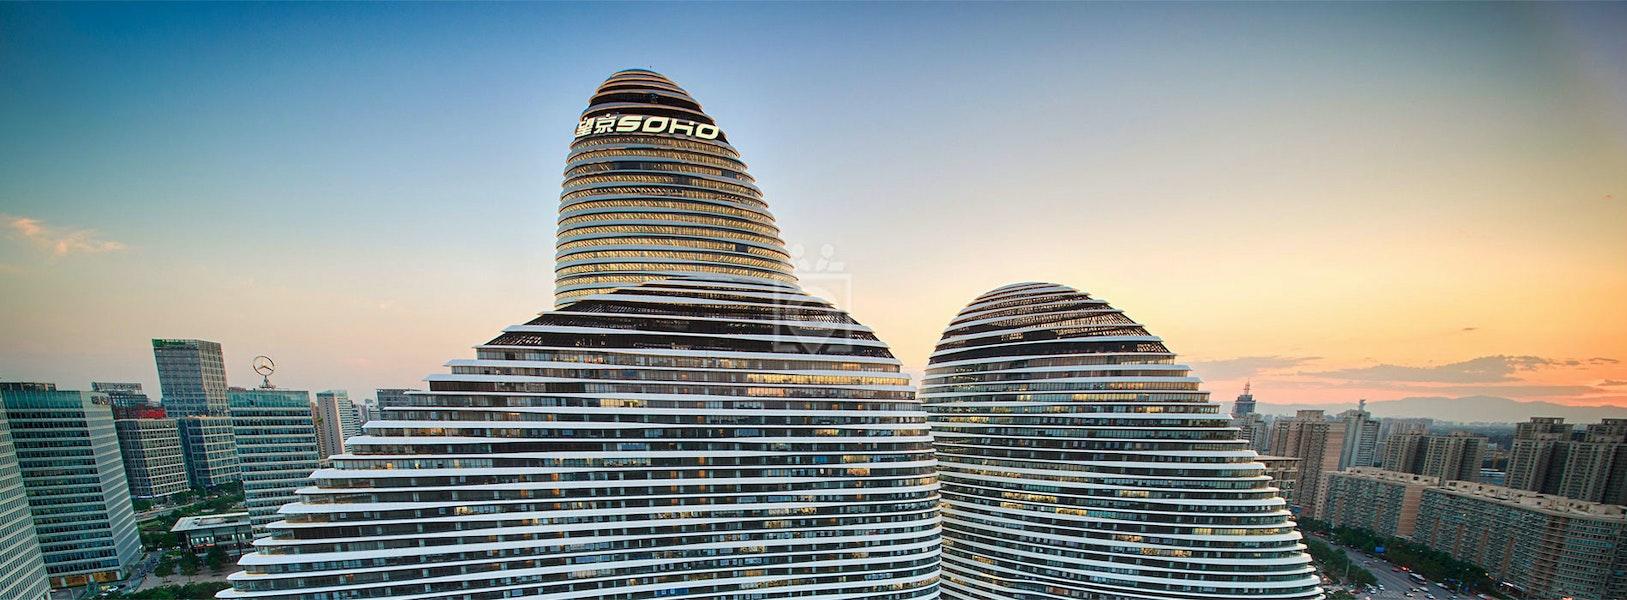 SOHO 3Q - Wangjing 3Q ll, Beijing